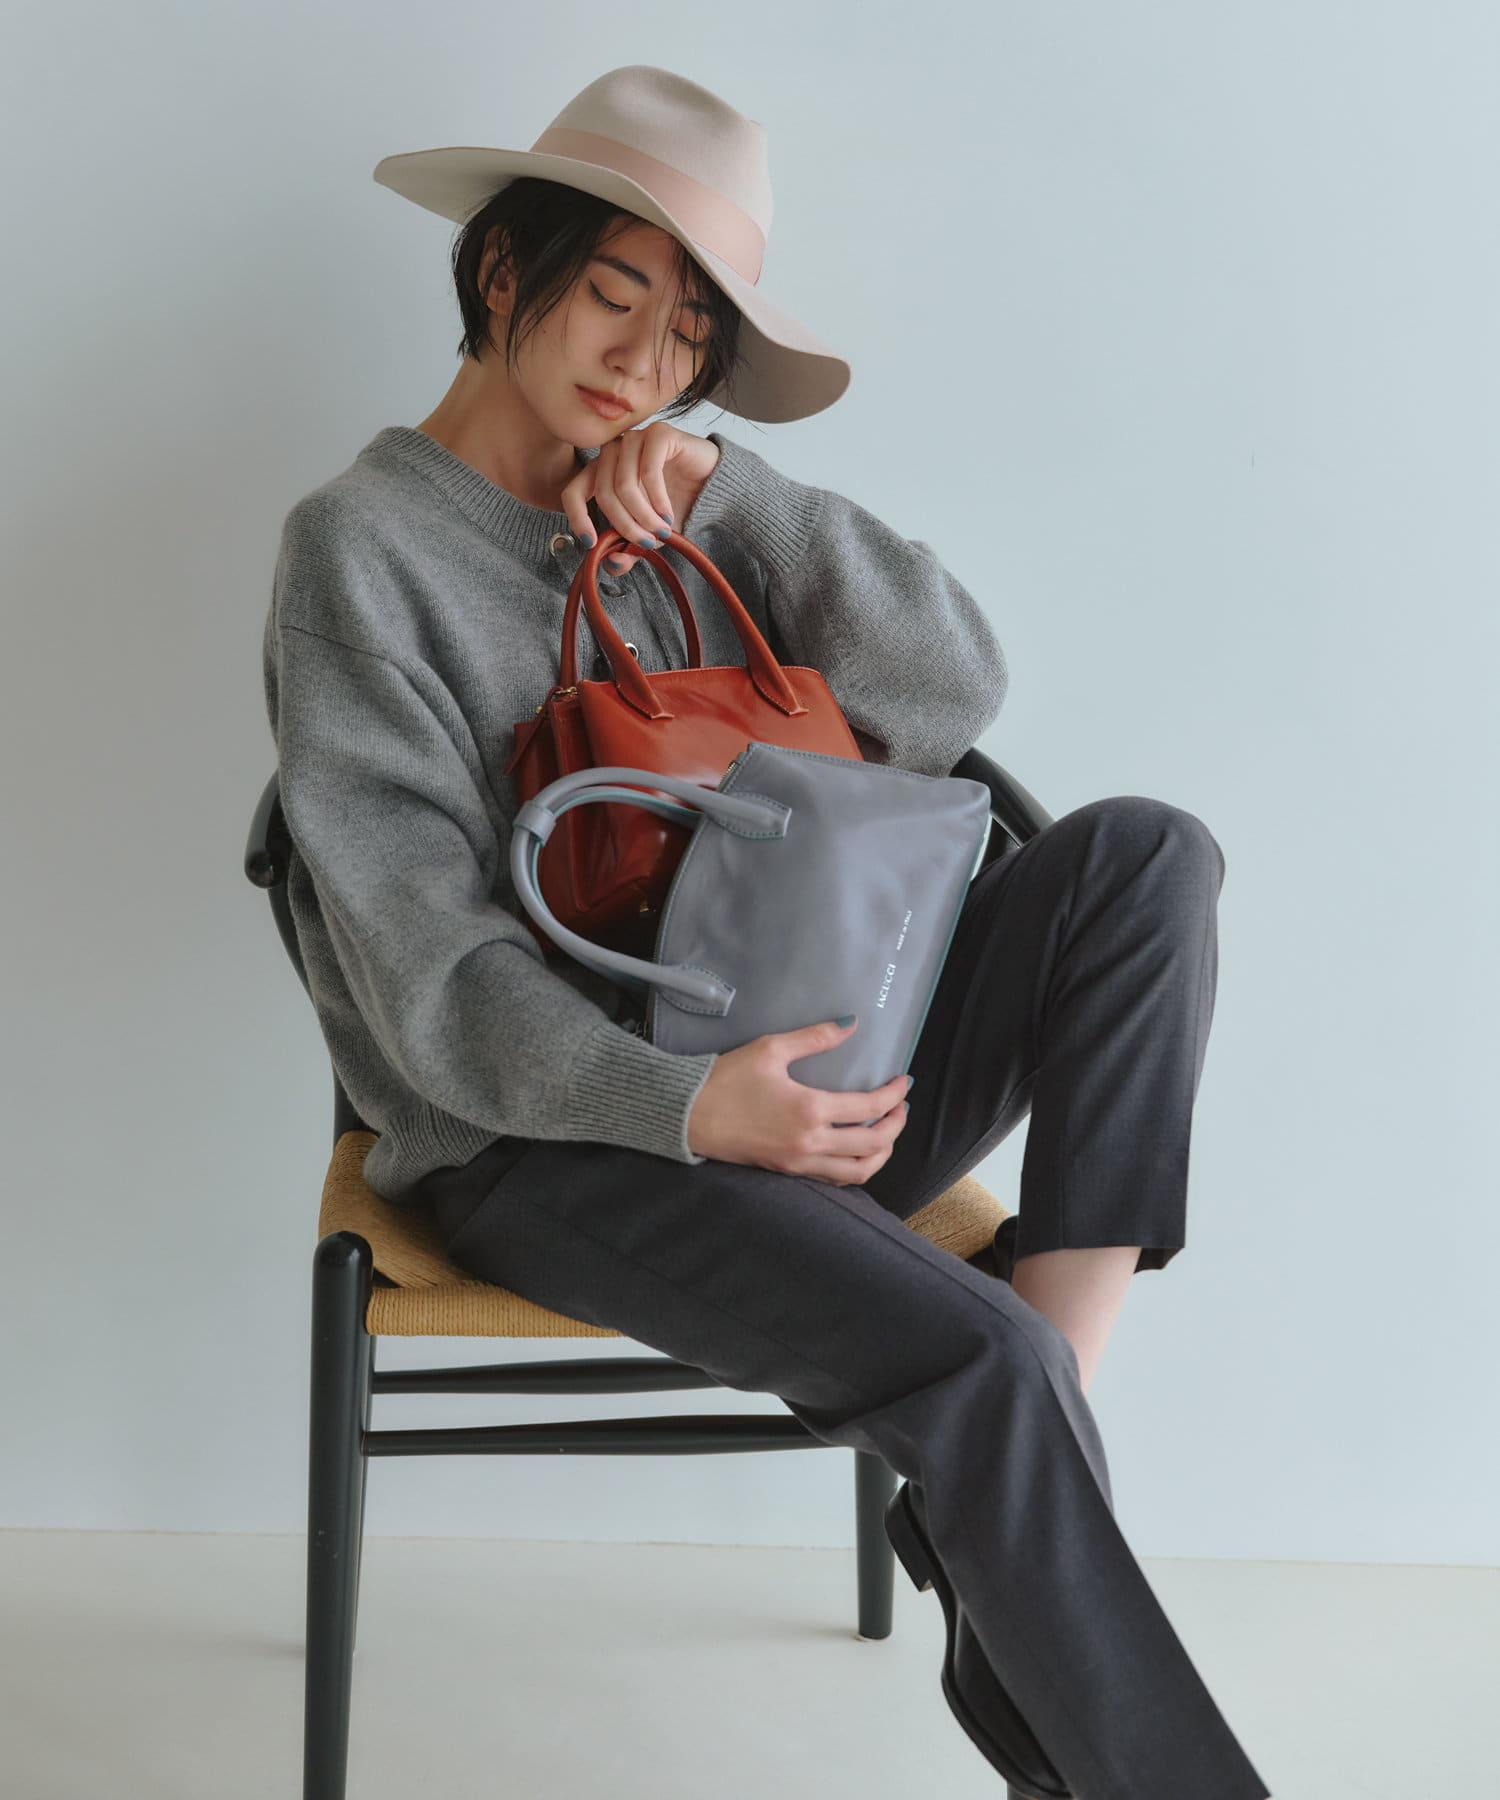 IACUCCI(イアクッチ) 2WAYトートバッグS【VELAR-2010/ATHENE】